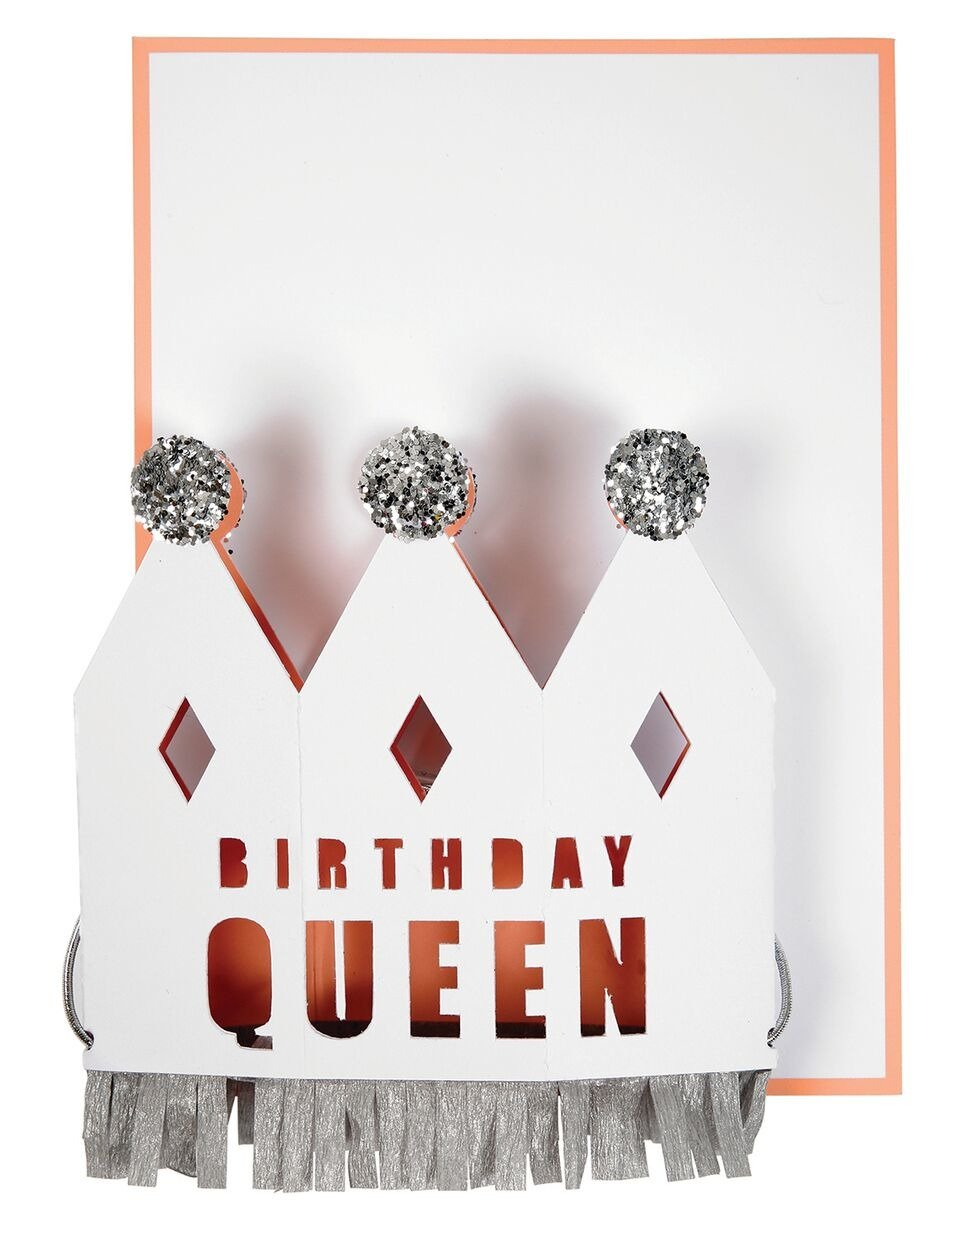 Meri Meri – Kartka okolicznościowa 3D Birthday Queen